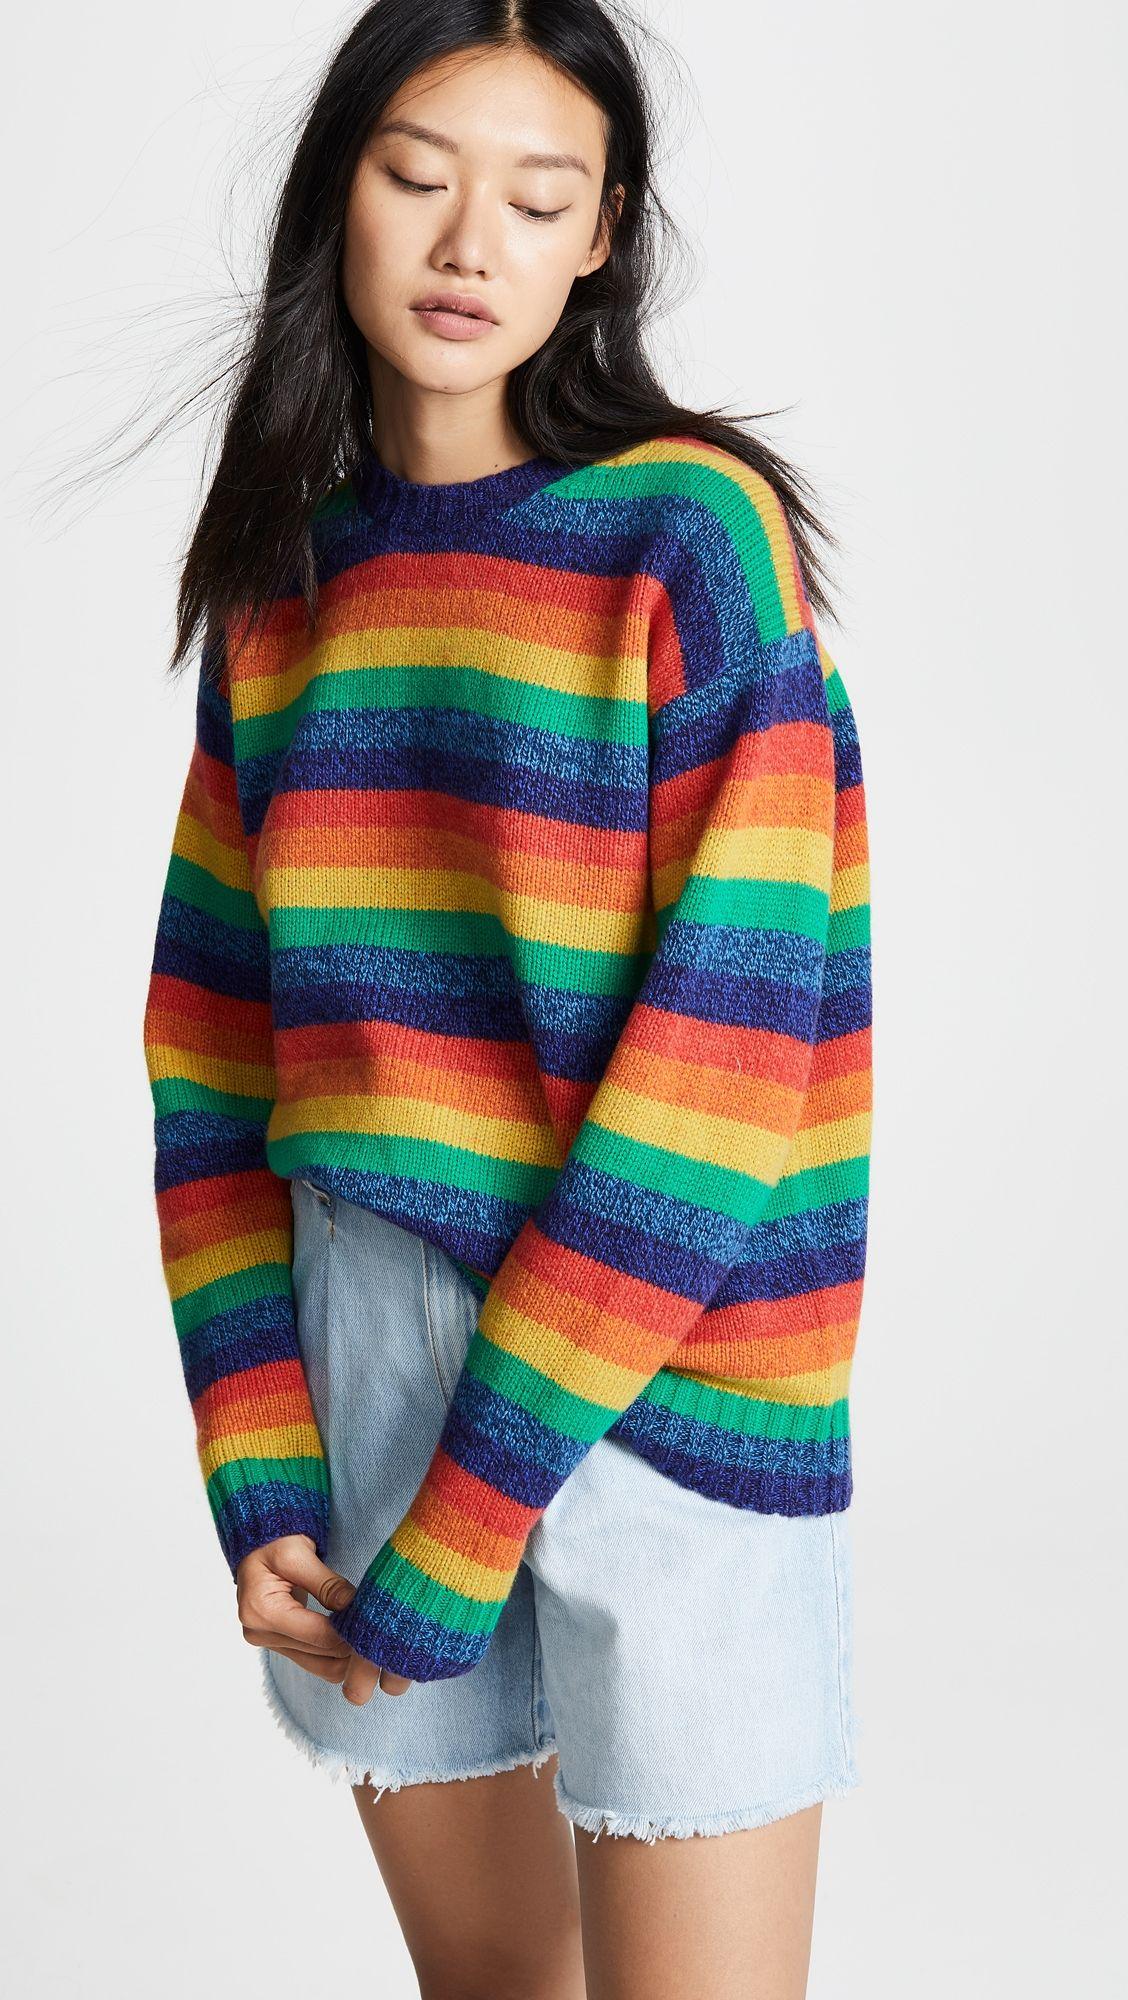 0cbfb3f4ffdd1 Samara Rainbow Sweater in 2019 | Products | Rainbow sweater ...